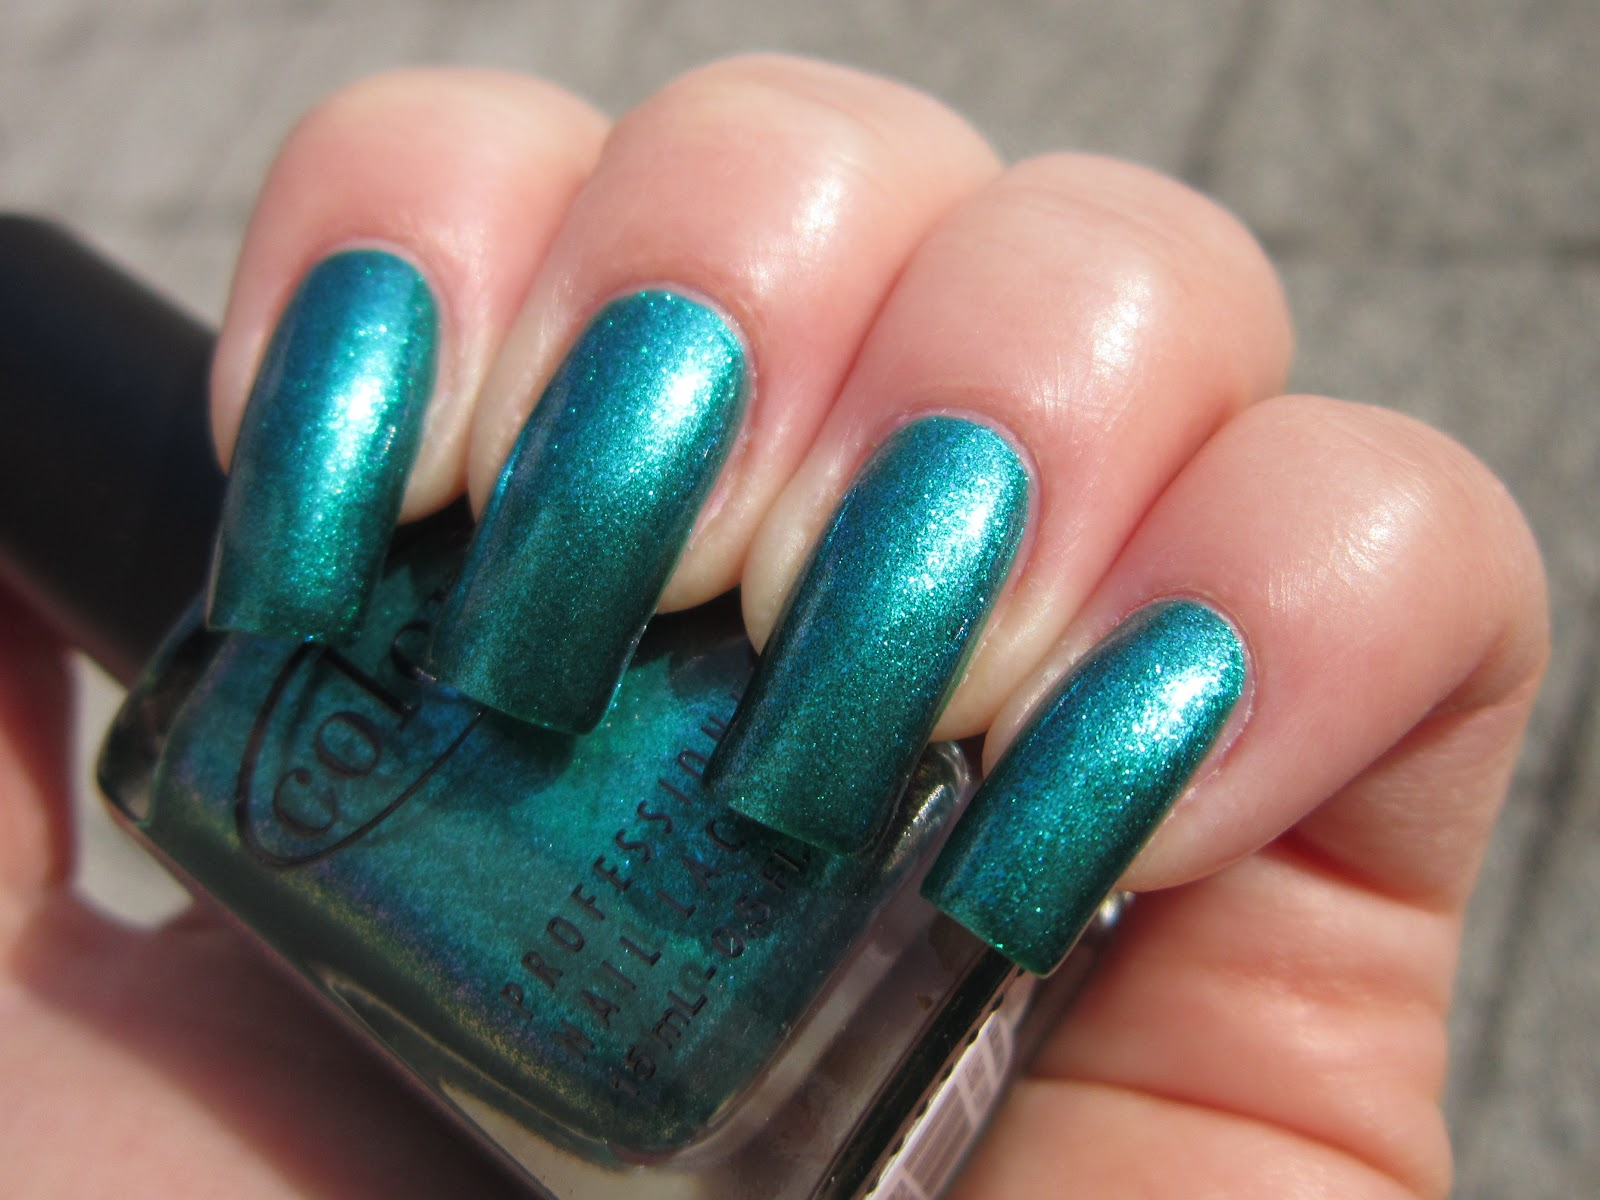 Color Club Metamorphosis Teal Green Metallic Blue Shimmer Nail Polish Ebay